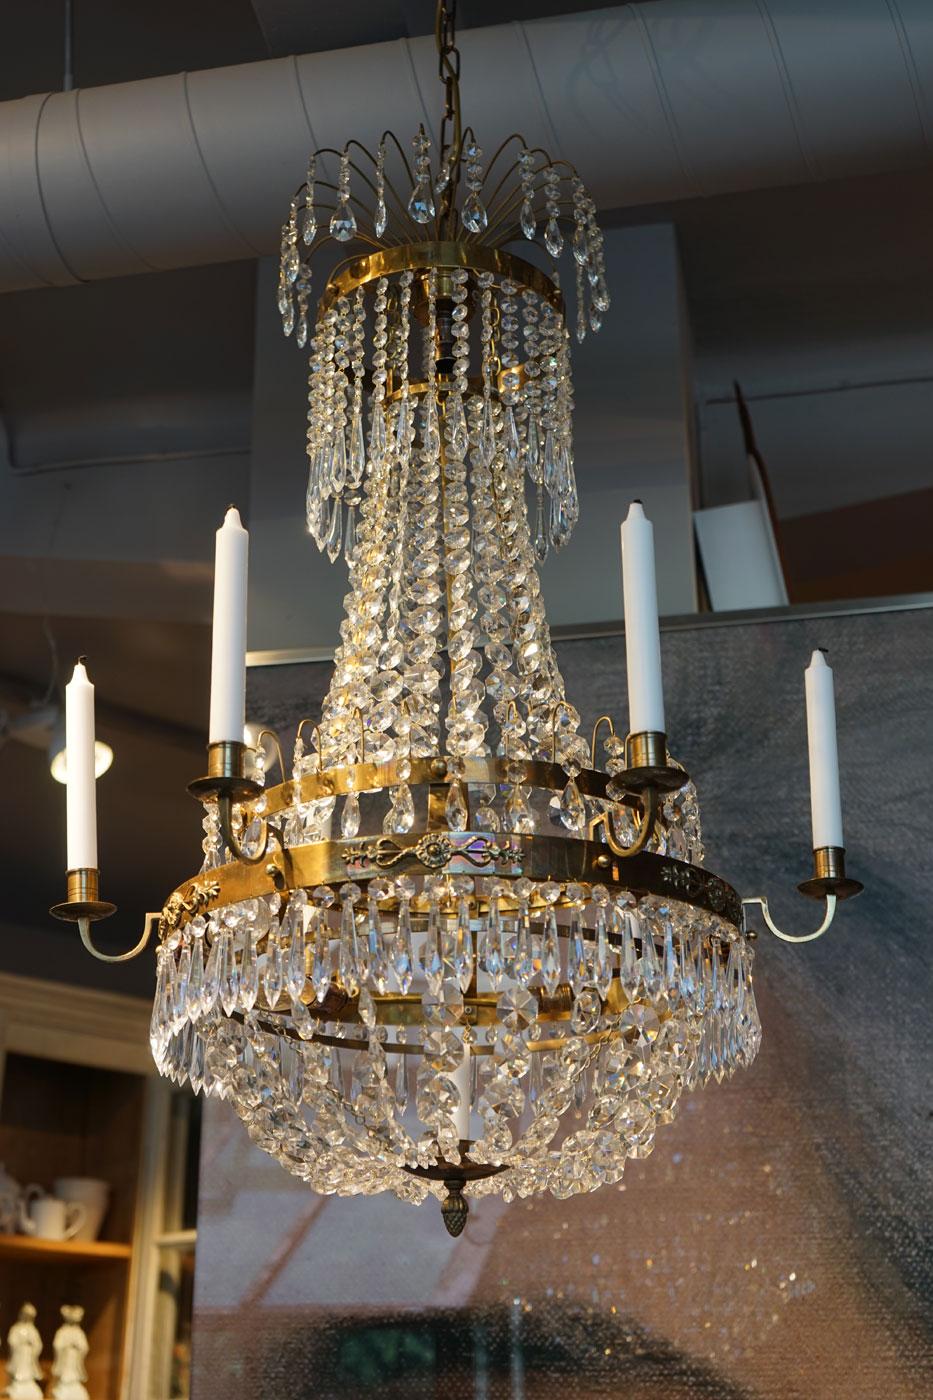 Taklampa krona sengustaviansk stil